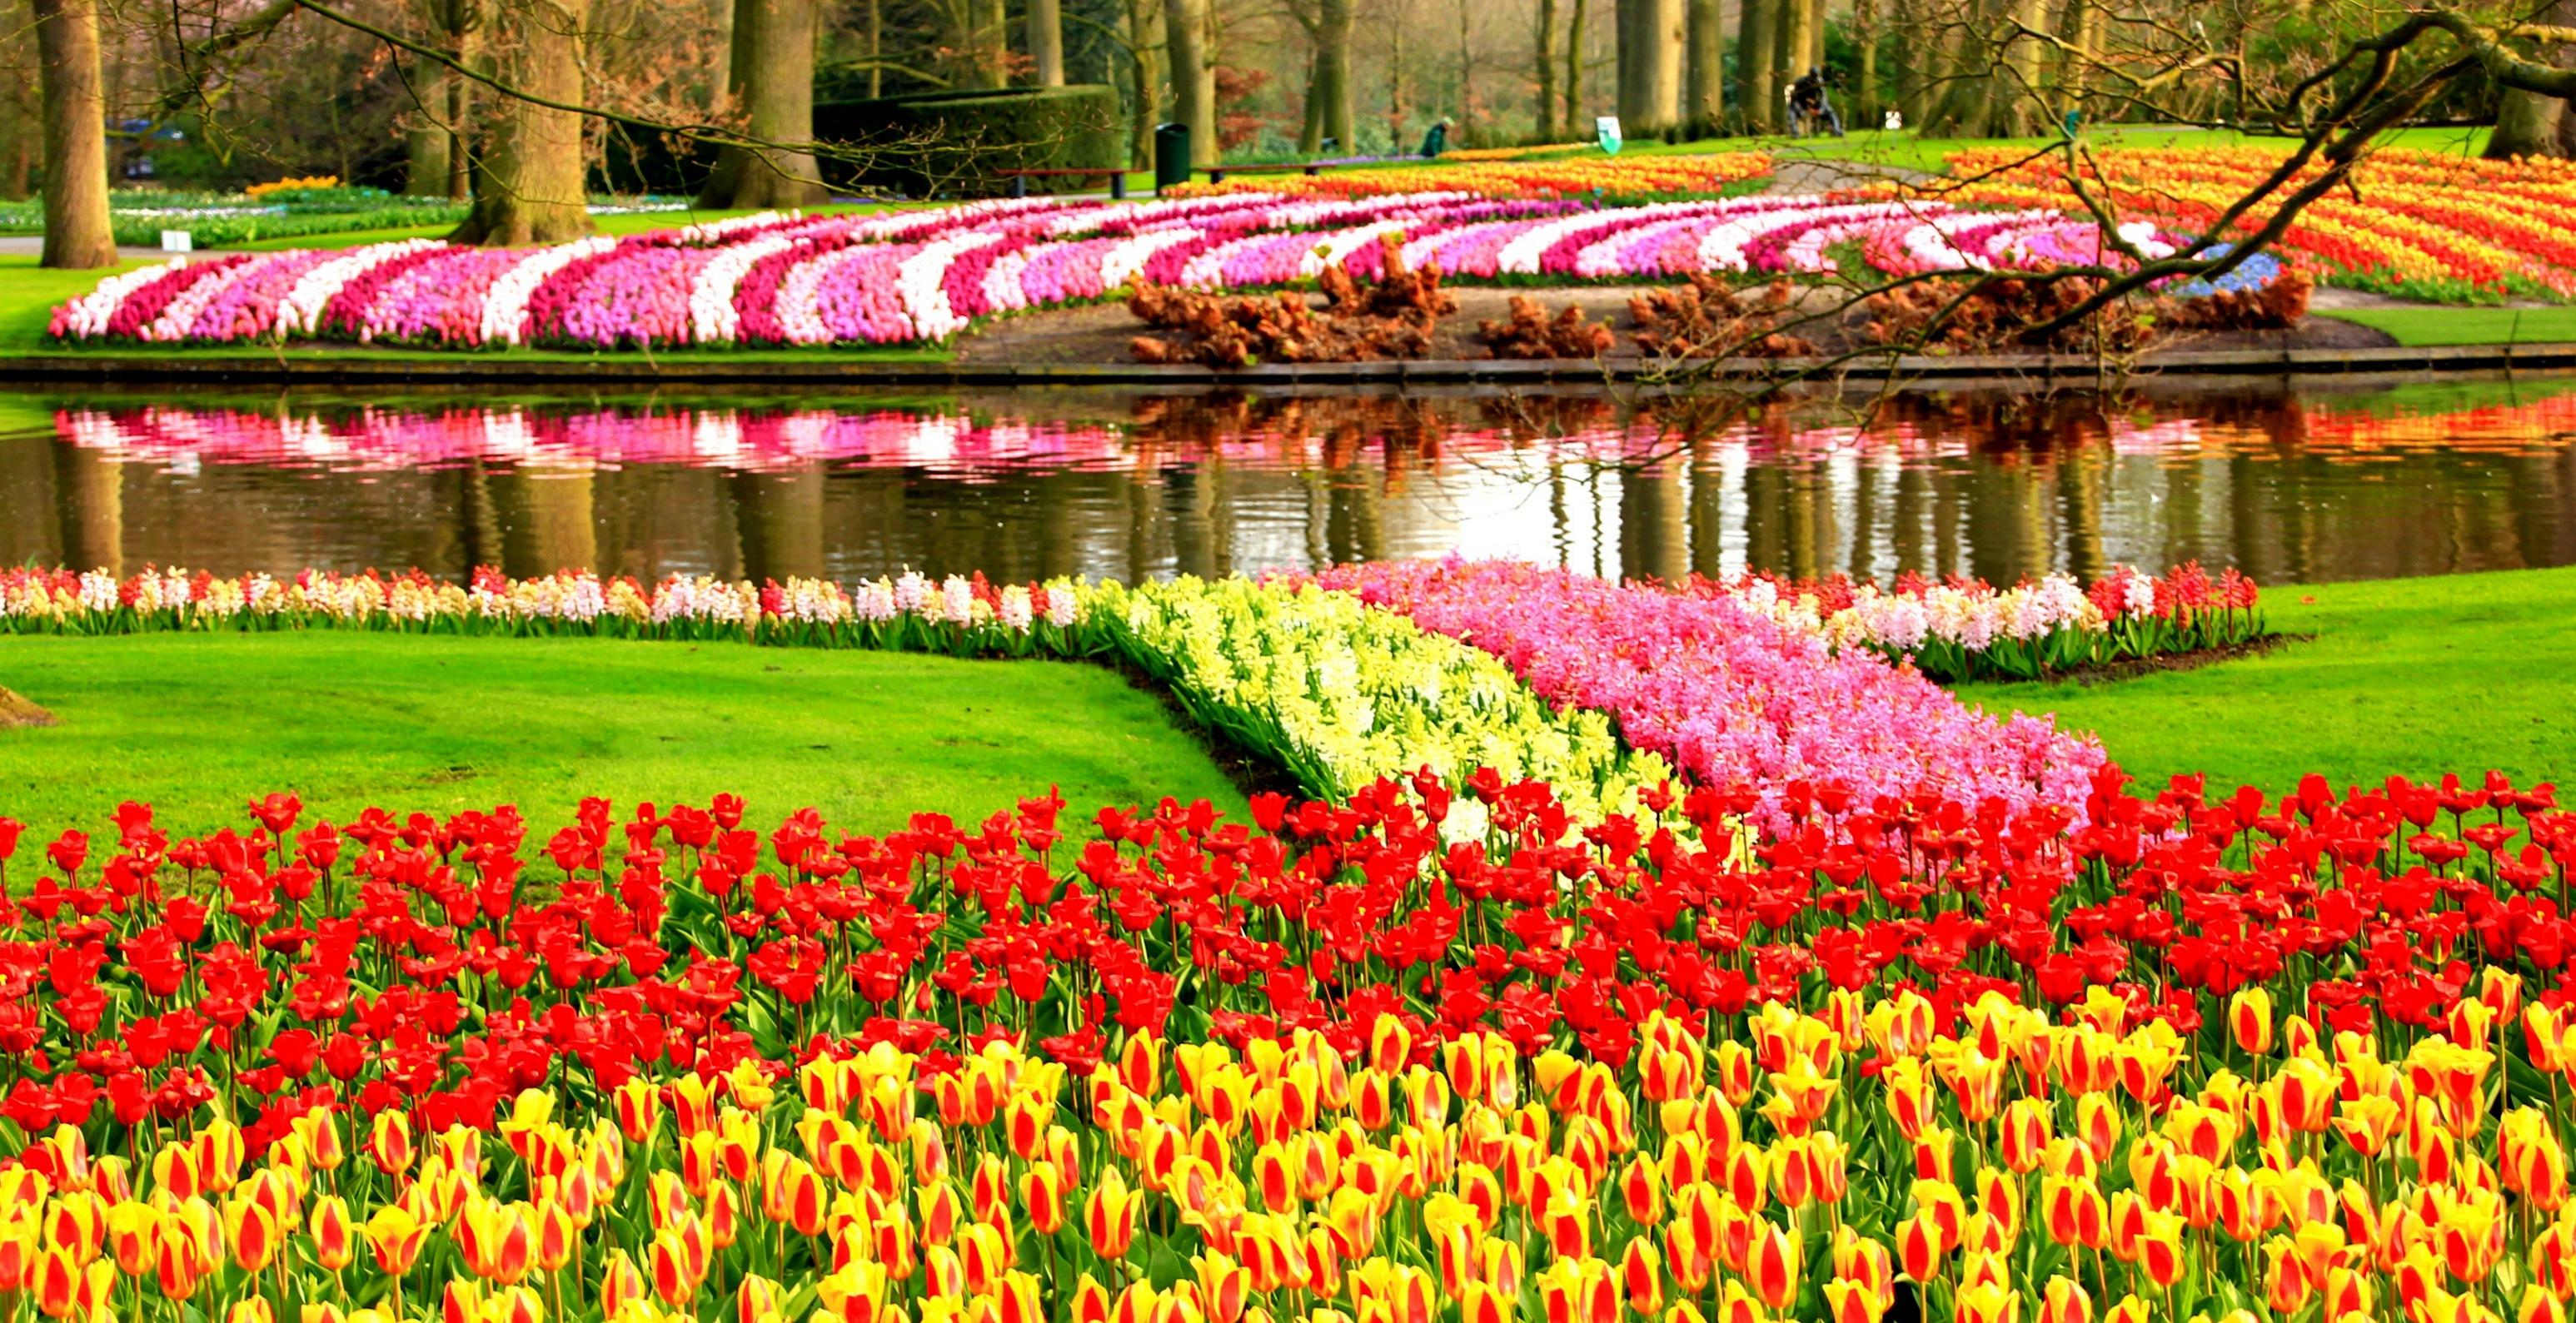 river flower garden wallpaper - photo #5